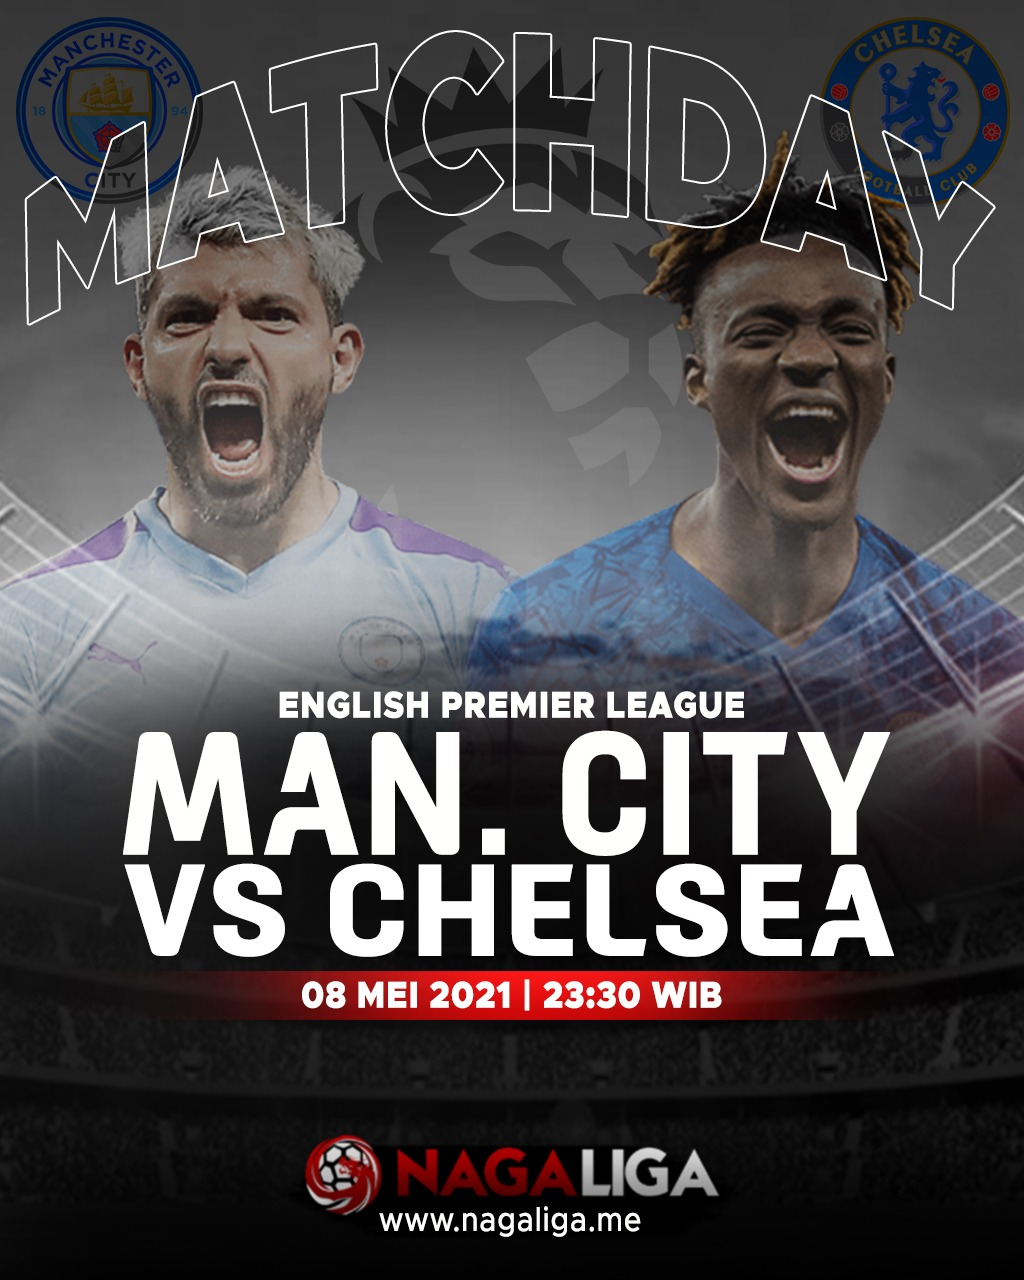 Jadwal dan Live Streaming Manchester City vs Chelsea